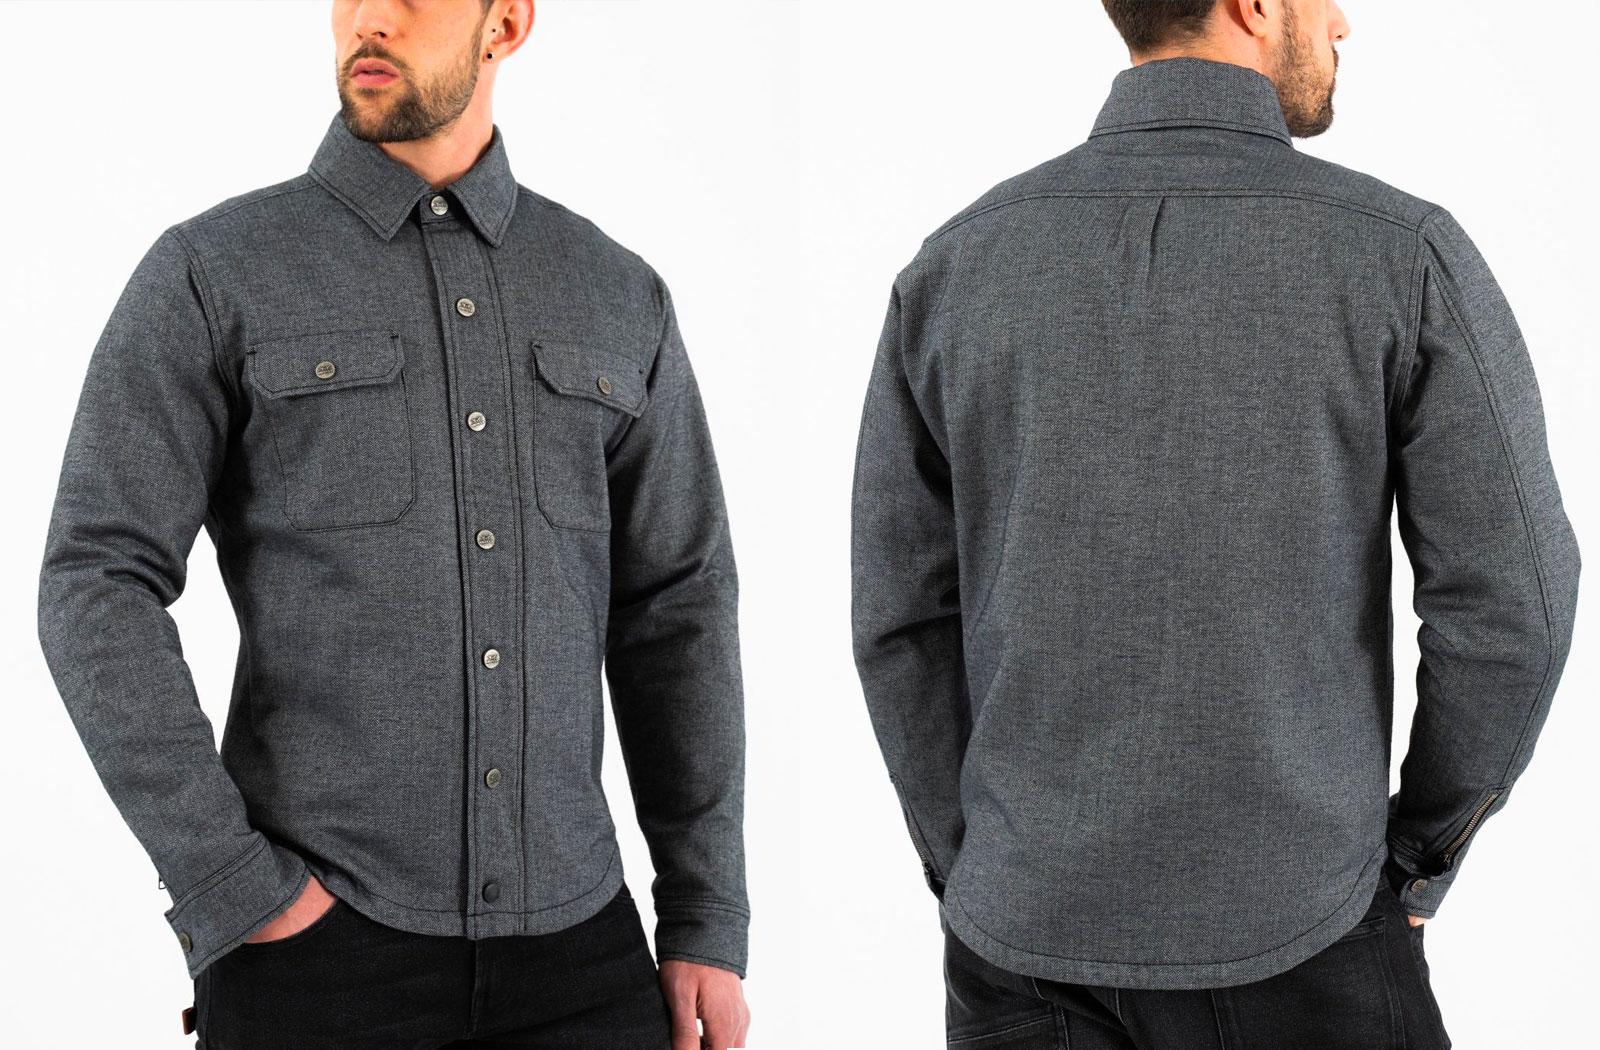 Rokker abrasion resistant riding shirts